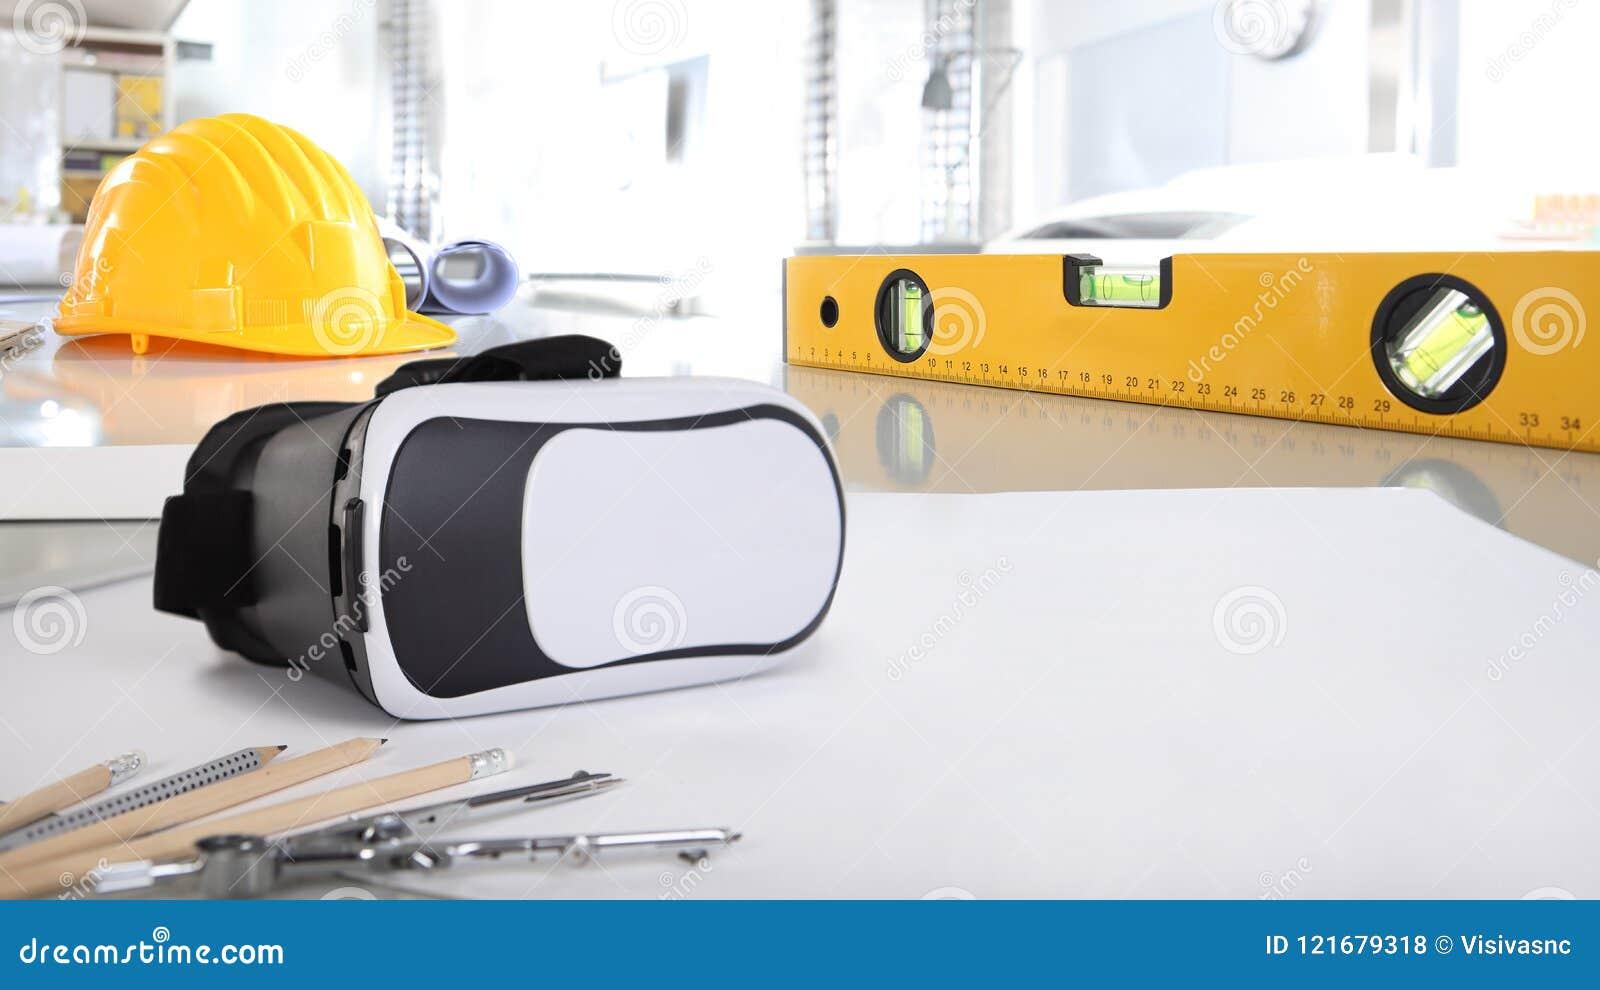 Constructio architectural de fond de bureau de bureau virtuel de réalité